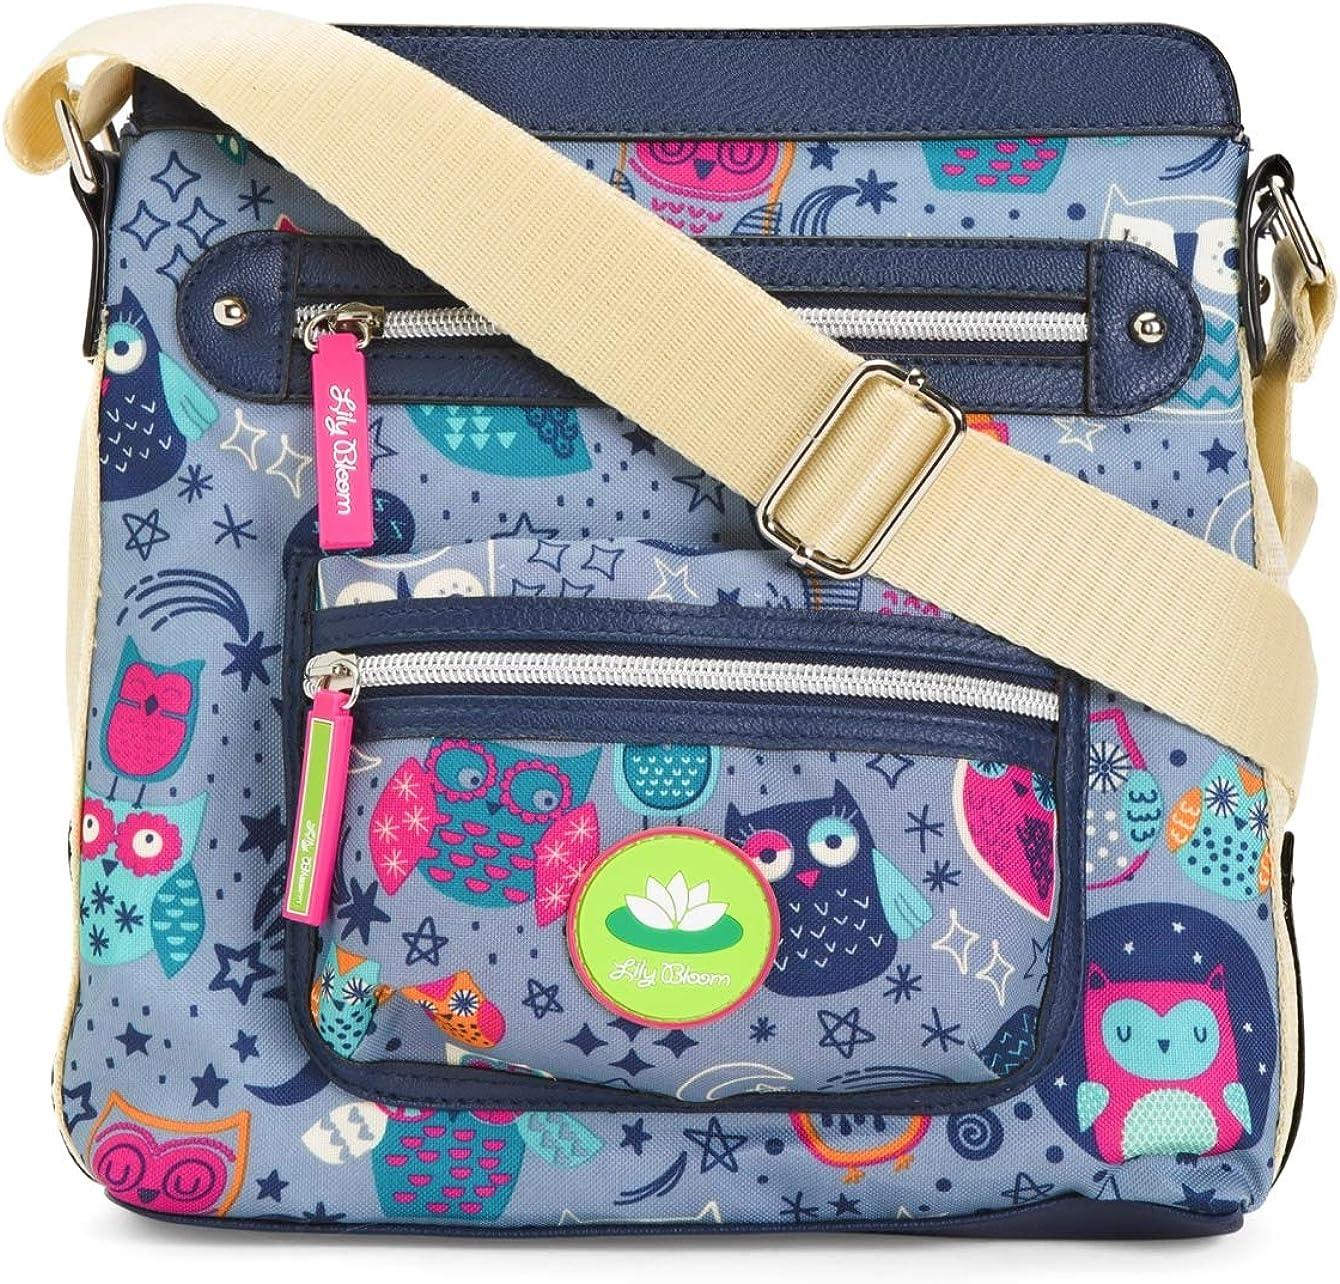 Lily Bloom Jaime Mini Crossbody Night Owl Handbag